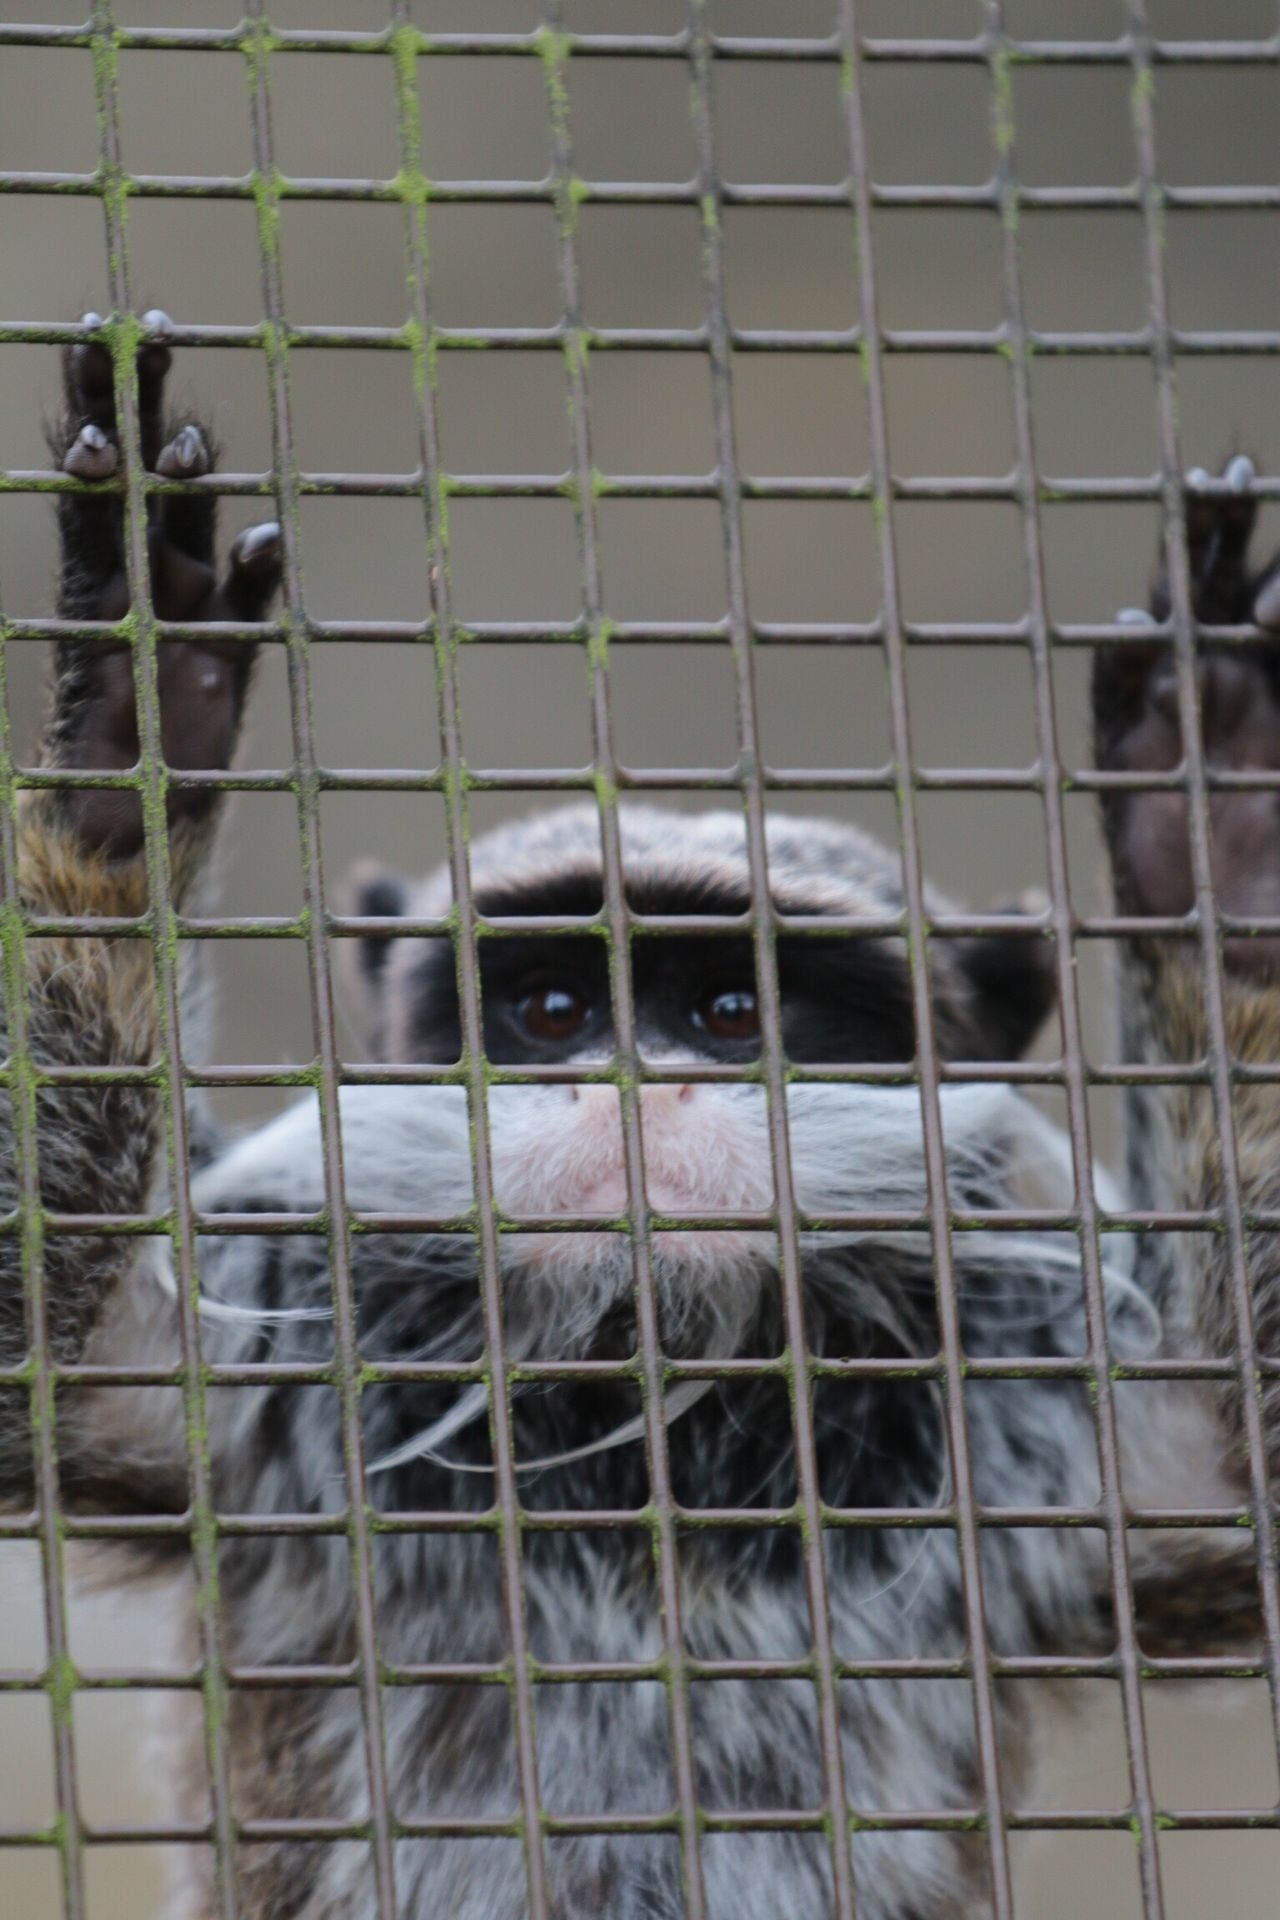 Why Me?  Help Help Me Caged Freedom Behind Bars